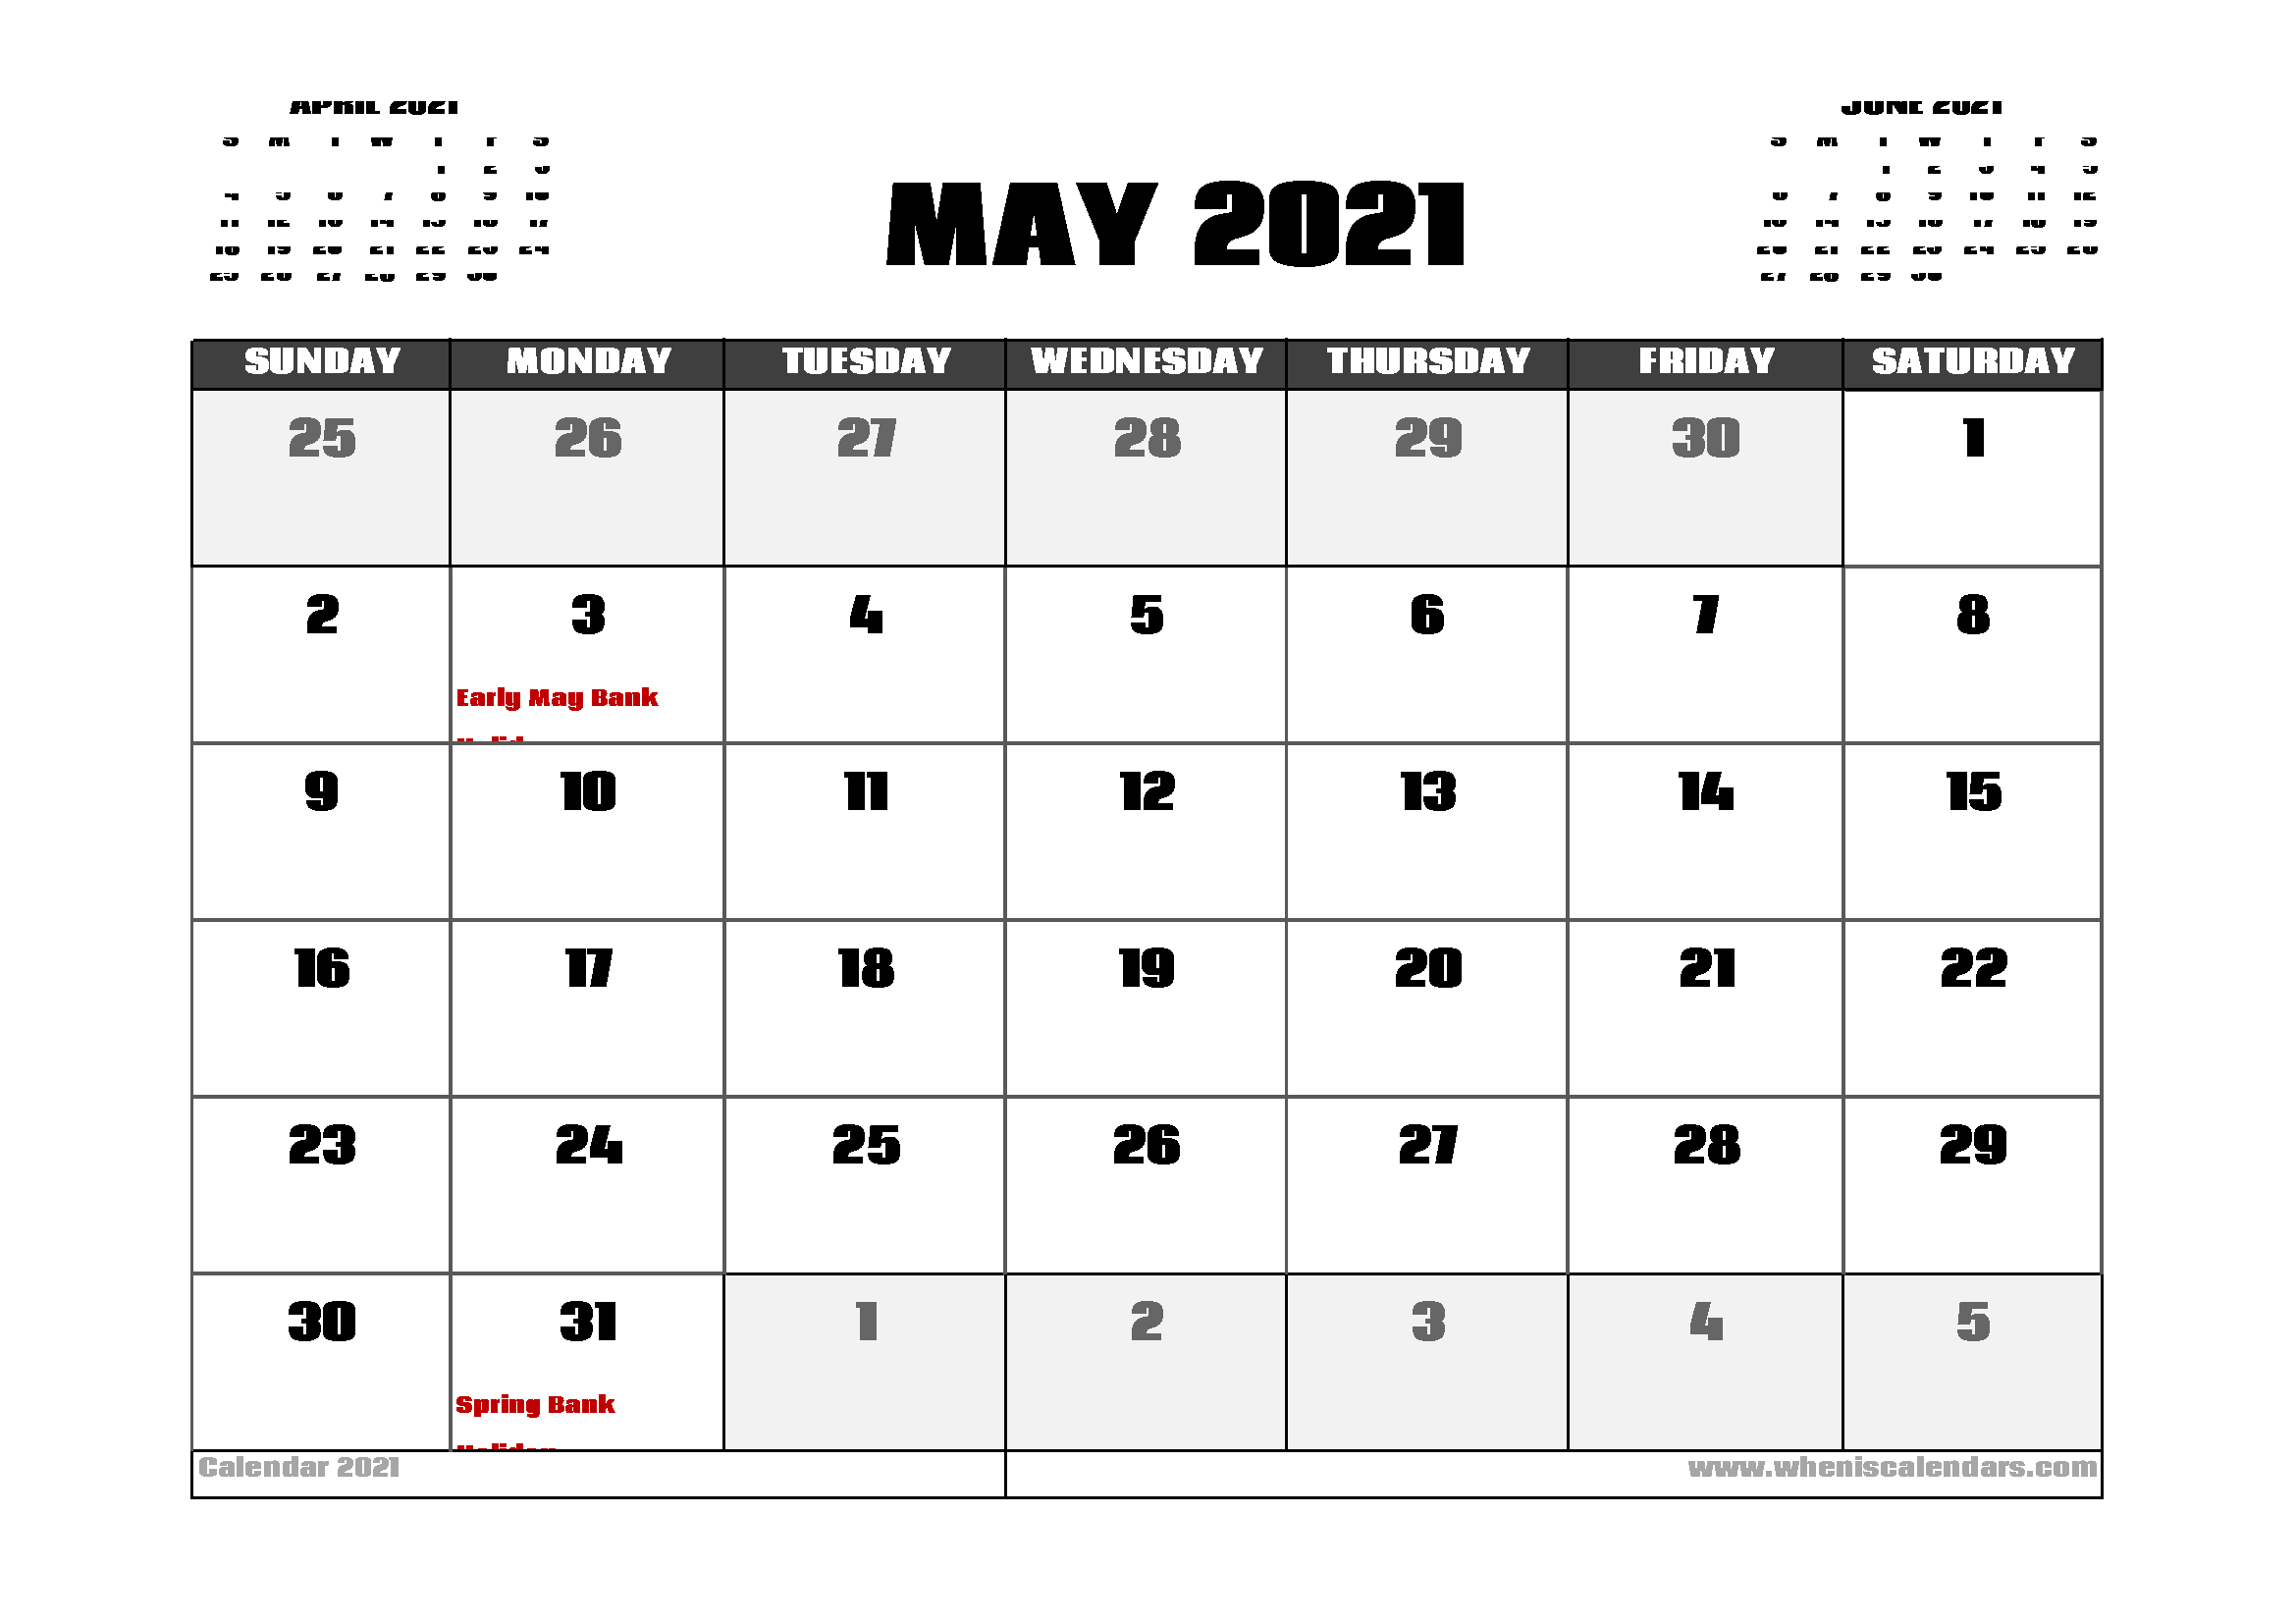 May 2021 Calendar UK with Holidays